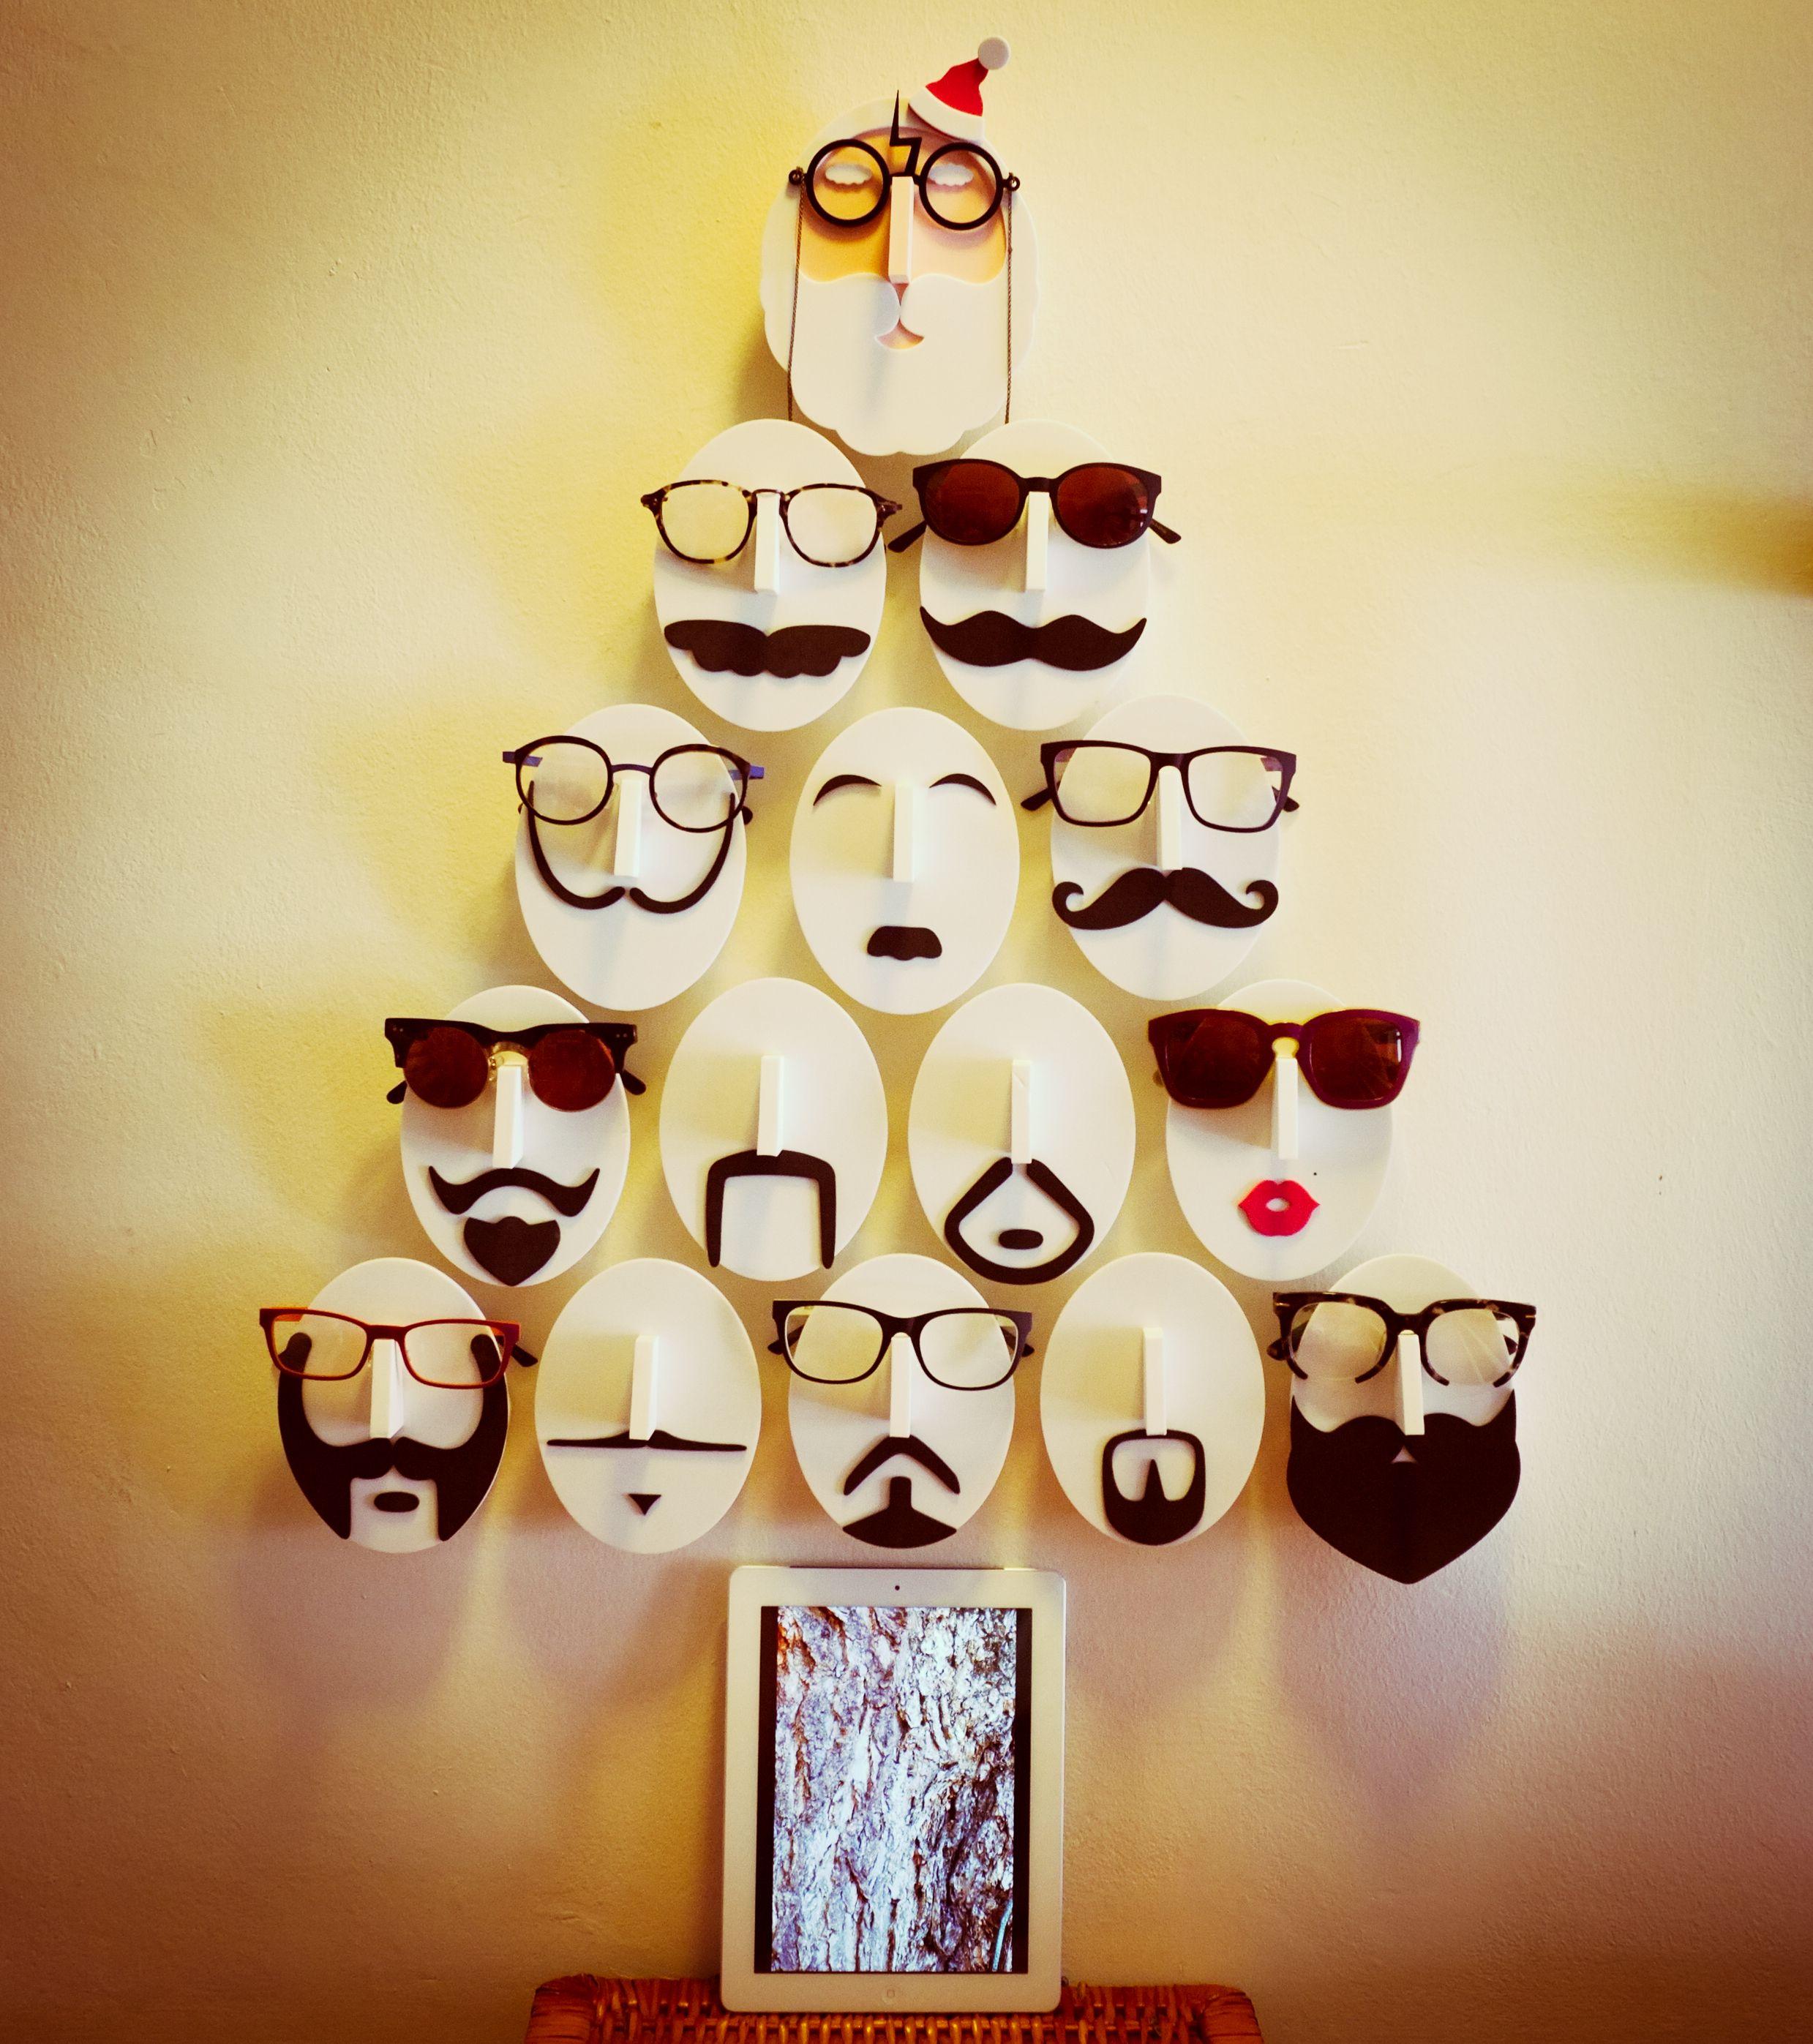 Eyeglasses display -  Movember Eyewear Display A Perfect Combination Of Glasses Movember And Christmas